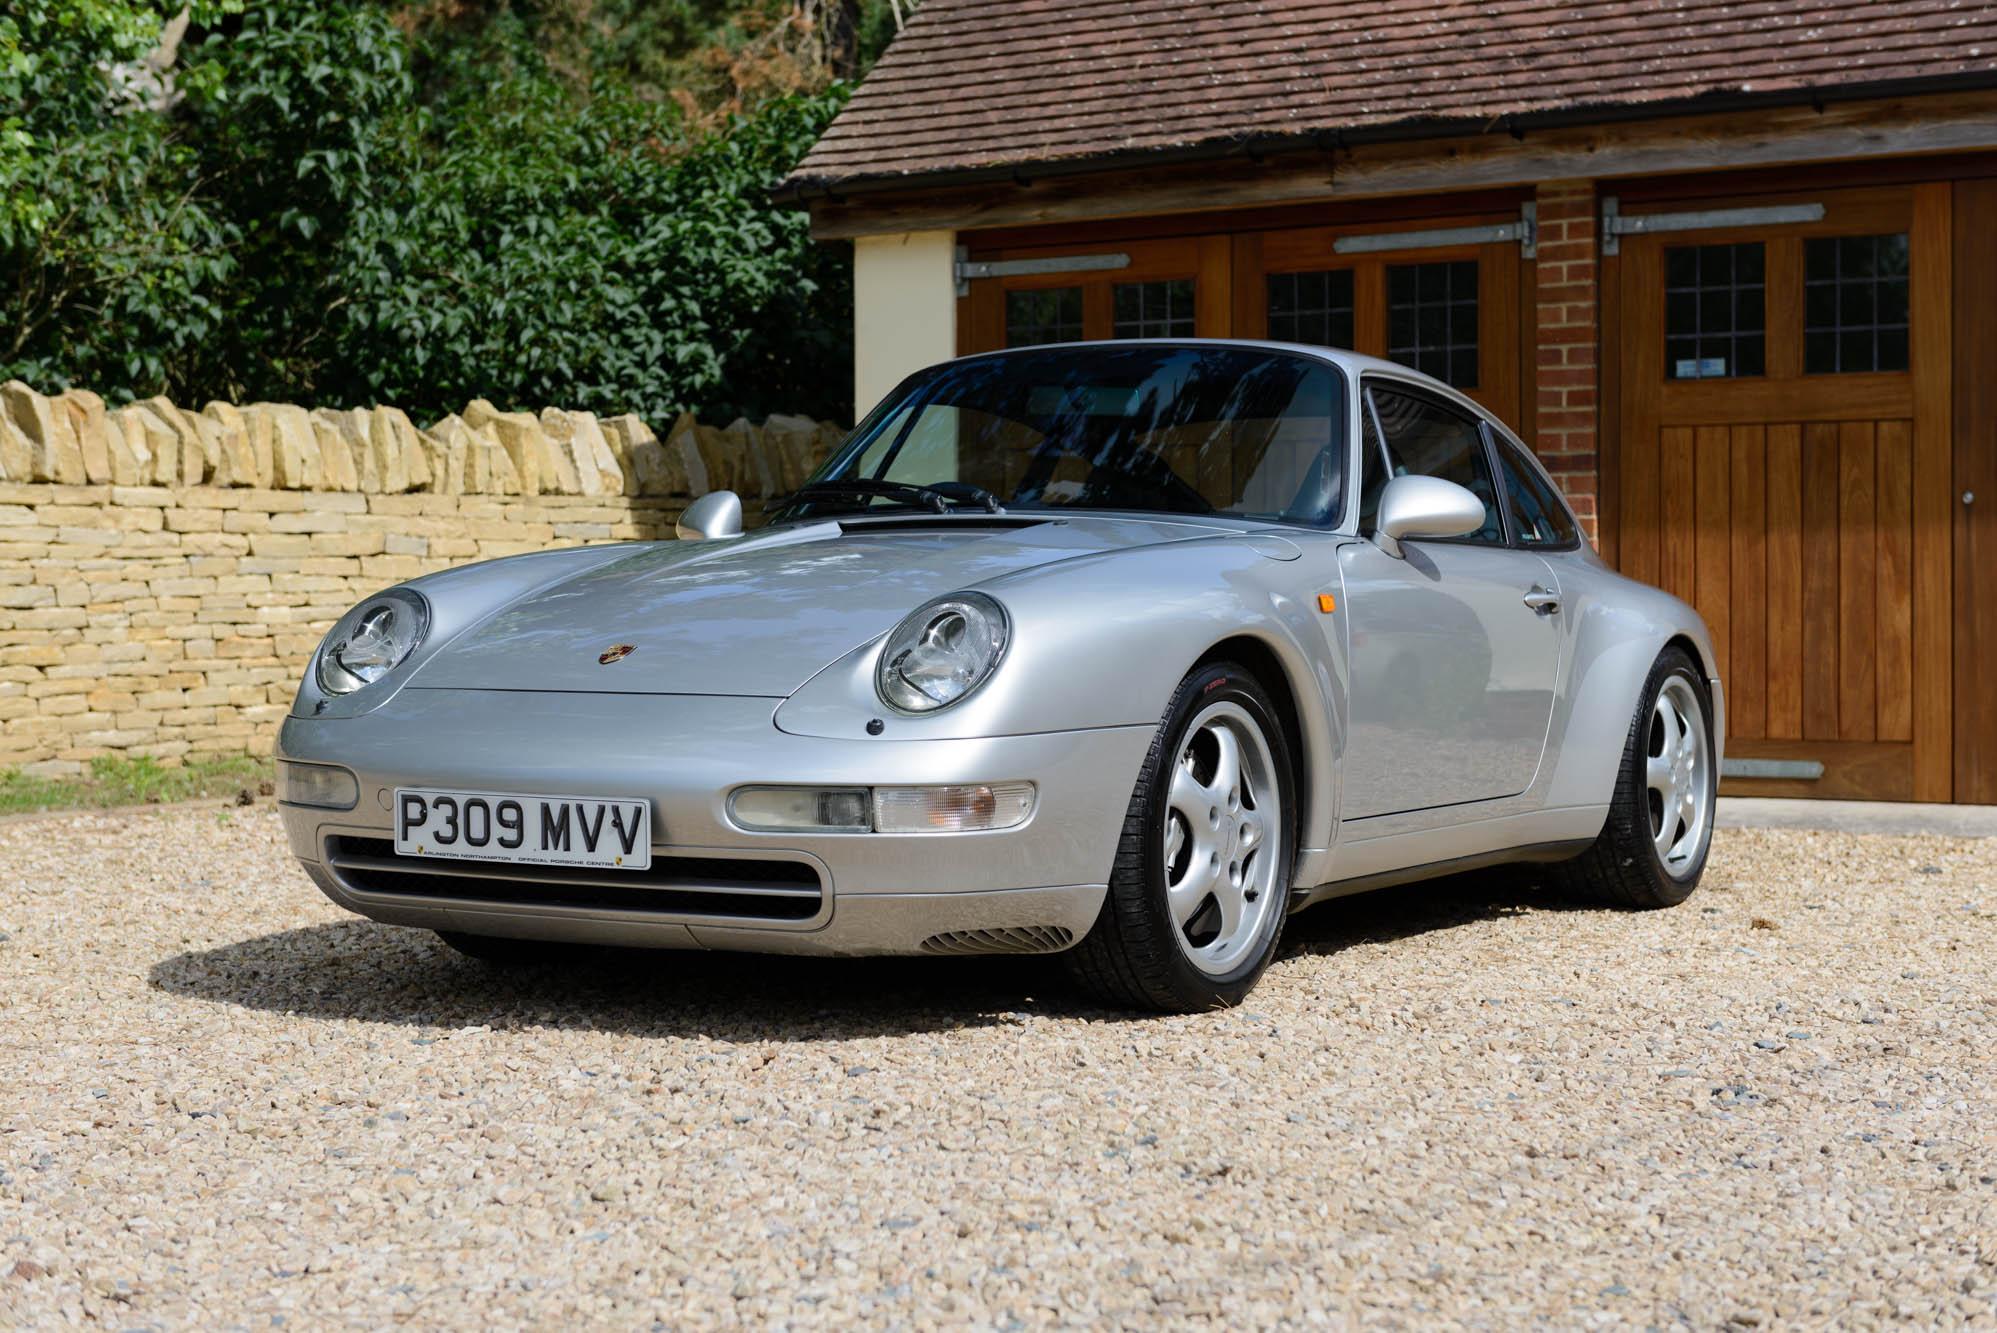 1997 PORSCHE 911 (993) CARRERA 4